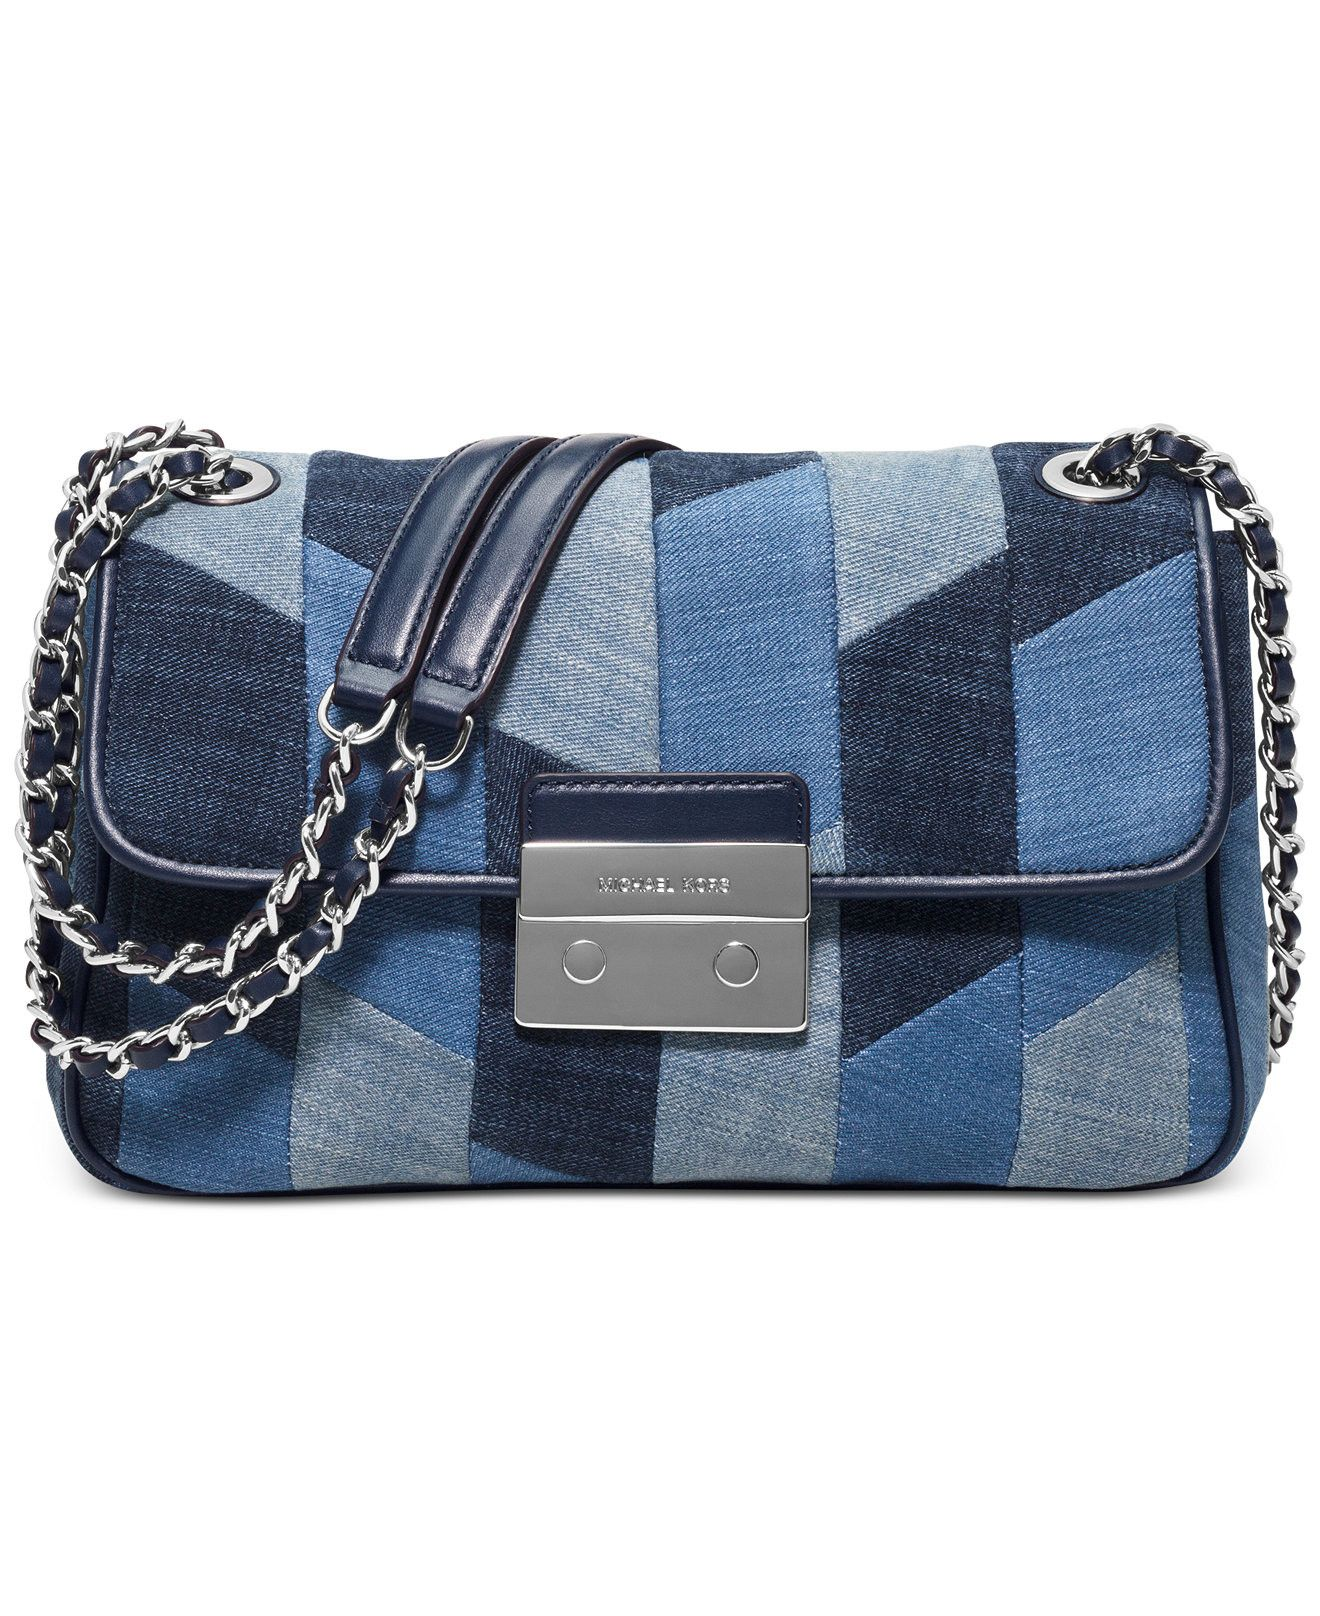 18257c019433 Michael Kors MICHAEL Sloan Large Chain Shoulder Bag